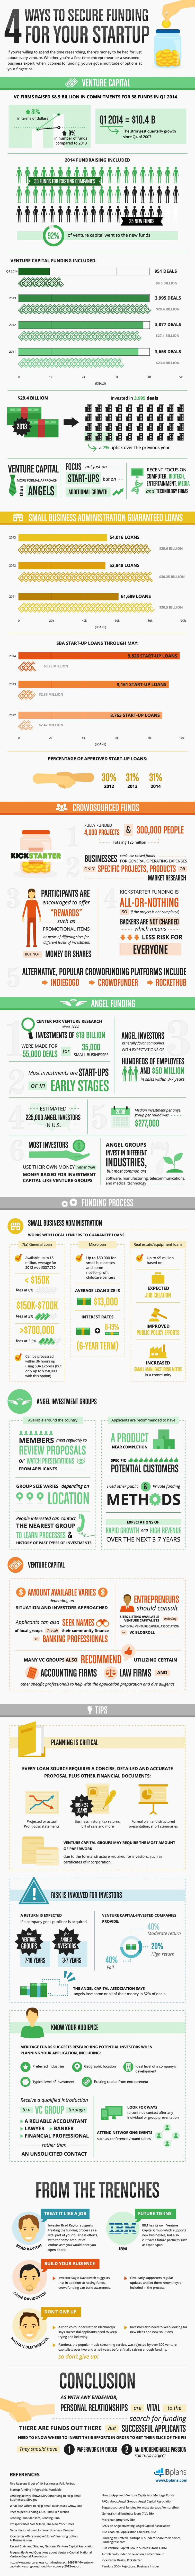 Startup Funding Explained